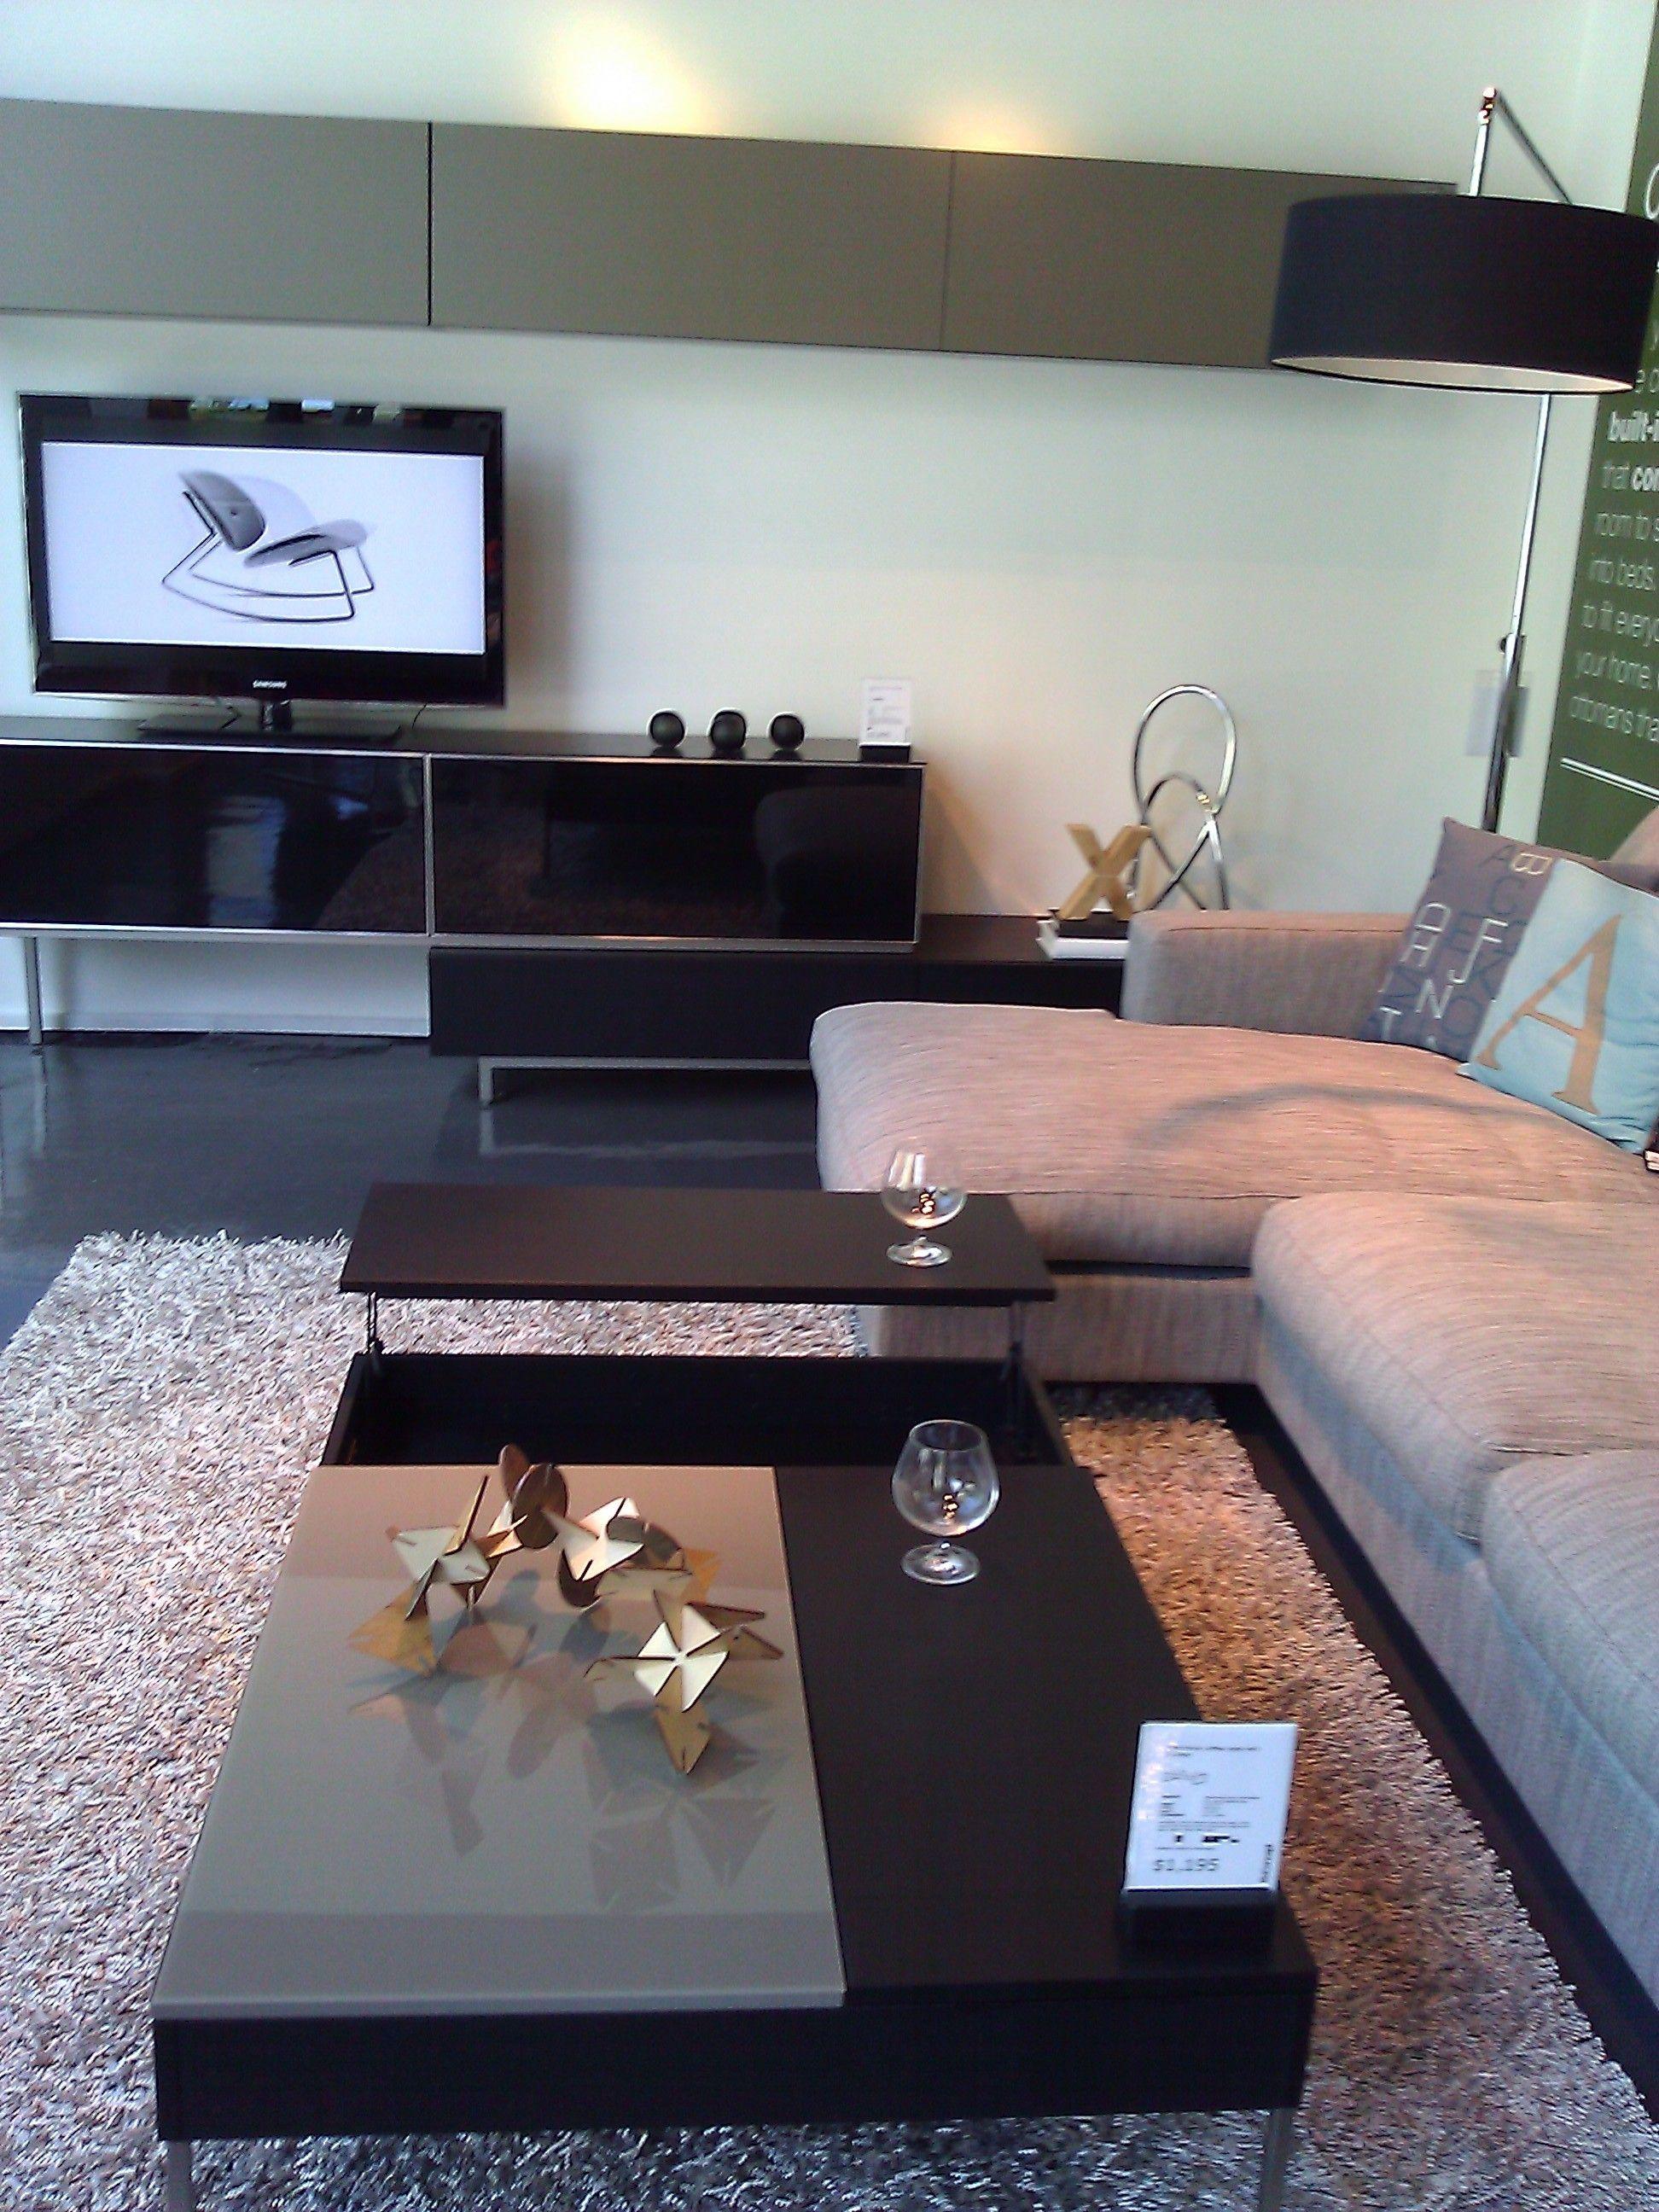 Interior design-ideen wohnzimmer mit tv bo concept roomsanta monica  decoracion  pinterest  bo concept